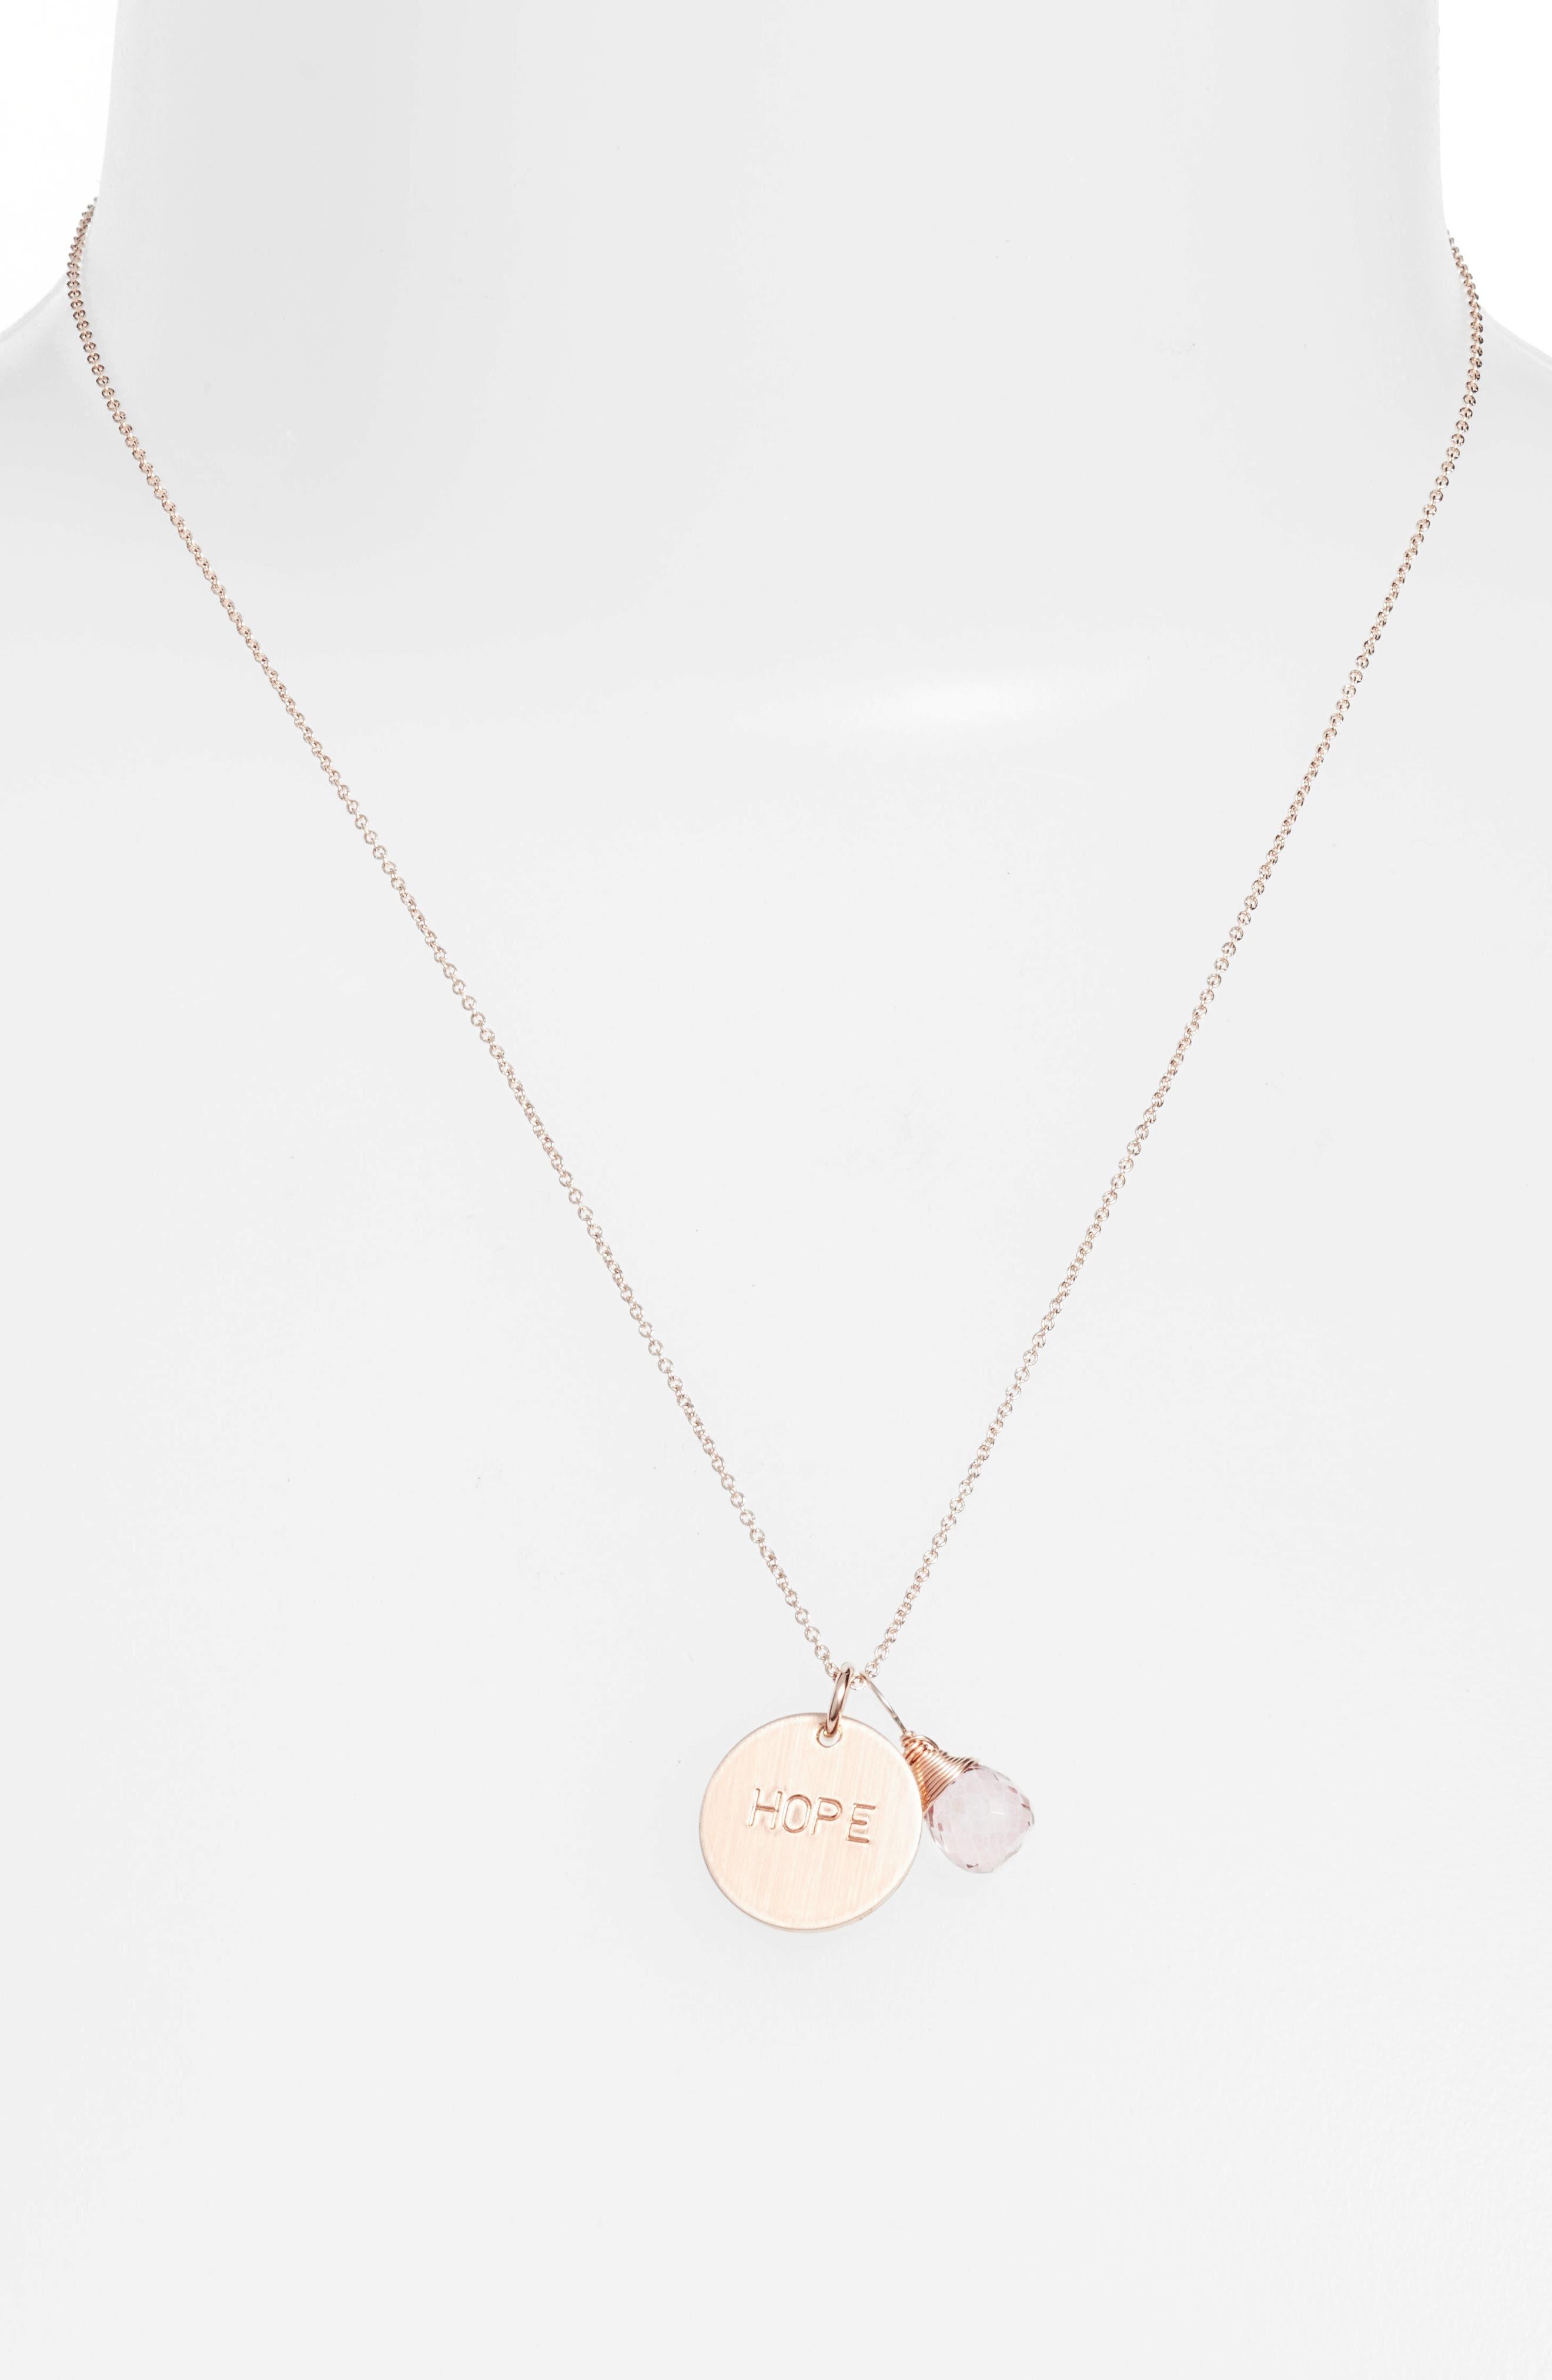 Main Image - Nashelle Pink Topaz & Hope Disc Necklace